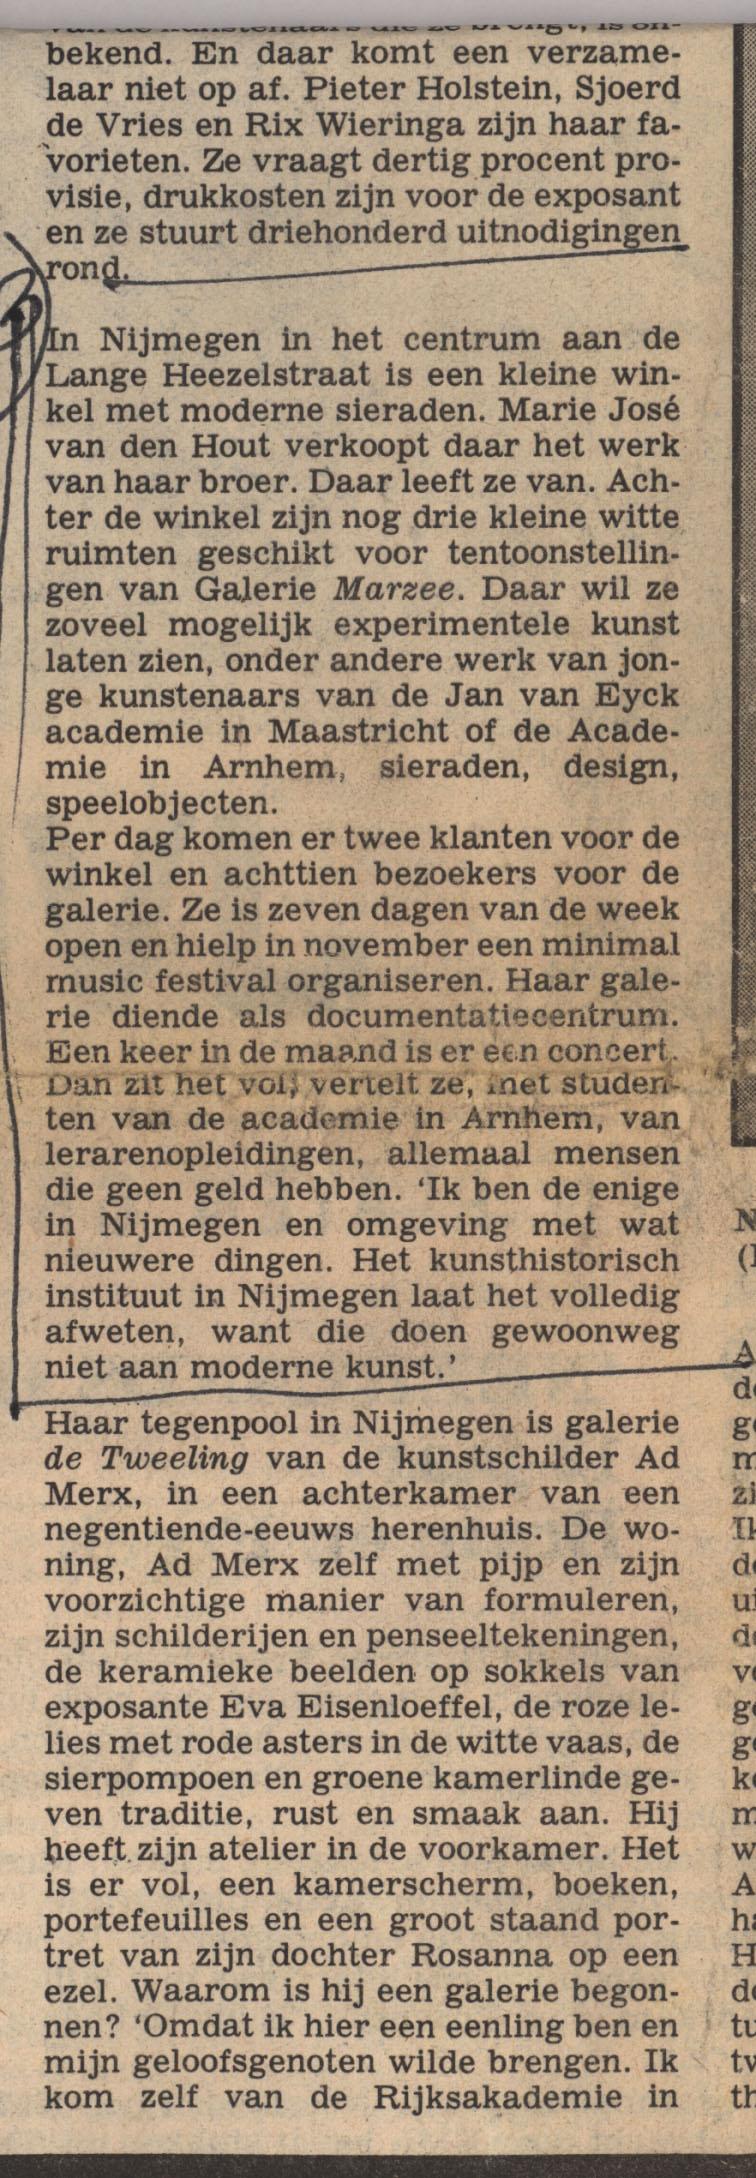 Krantenknipsel Galerie Marzee, Vrij Nederland, 1982, papier, drukwerk